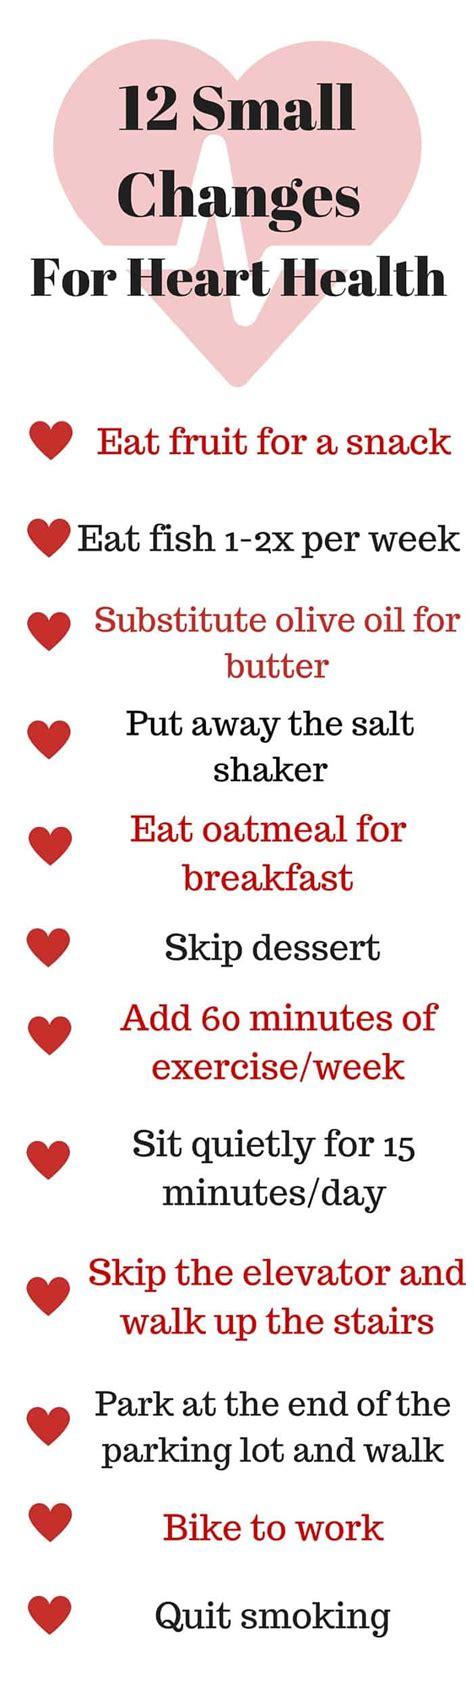 american heart congestive failure diet picture 3